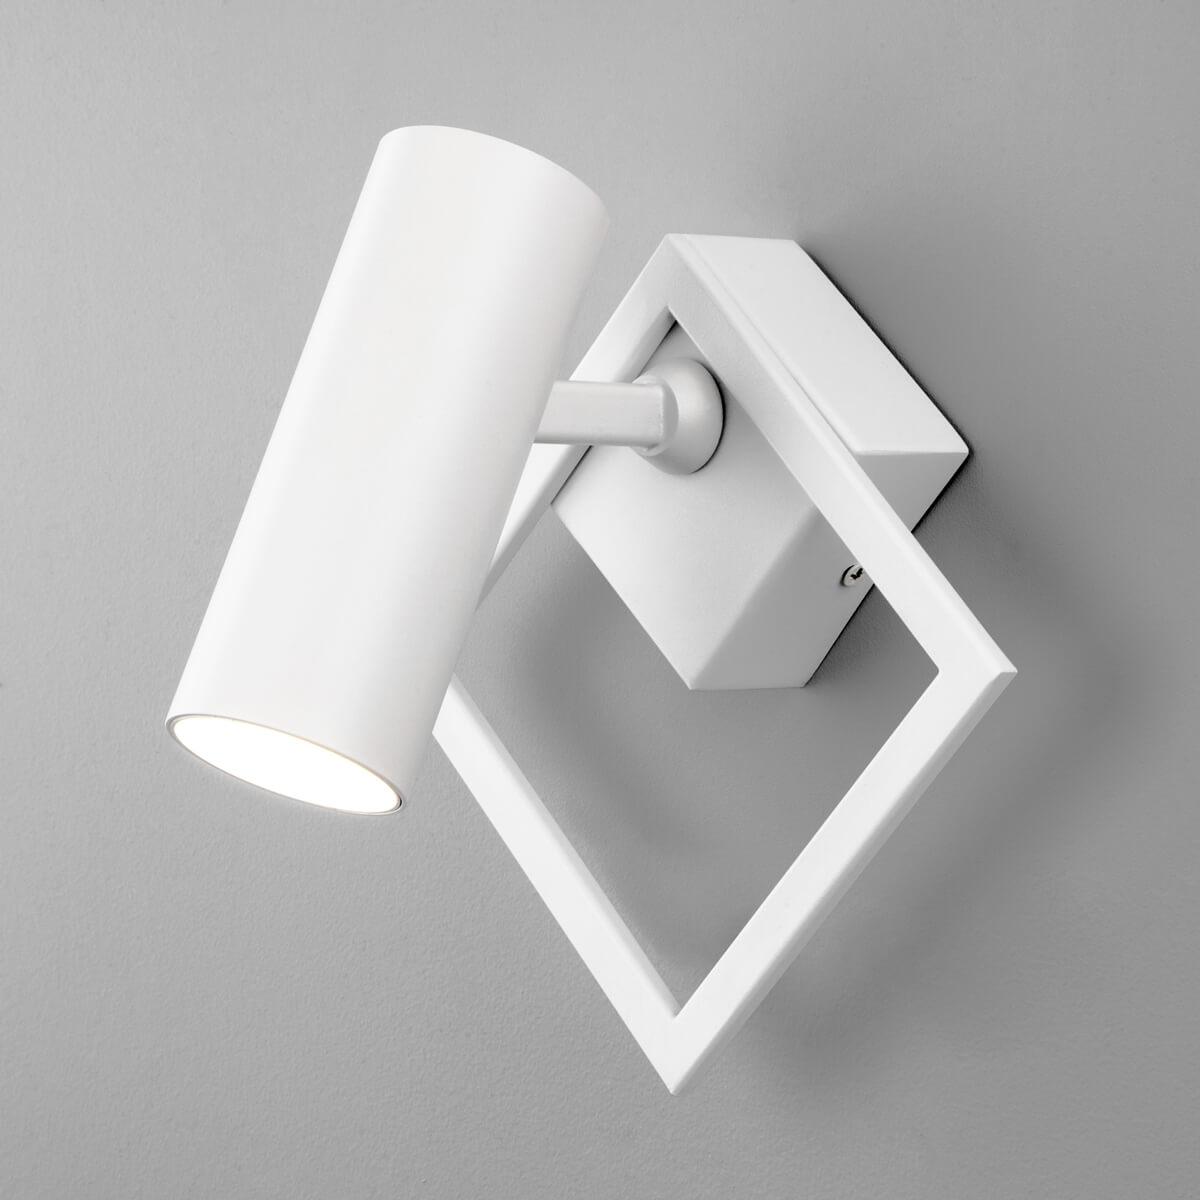 Спот Eurosvet 20091/1 LED белый Turro